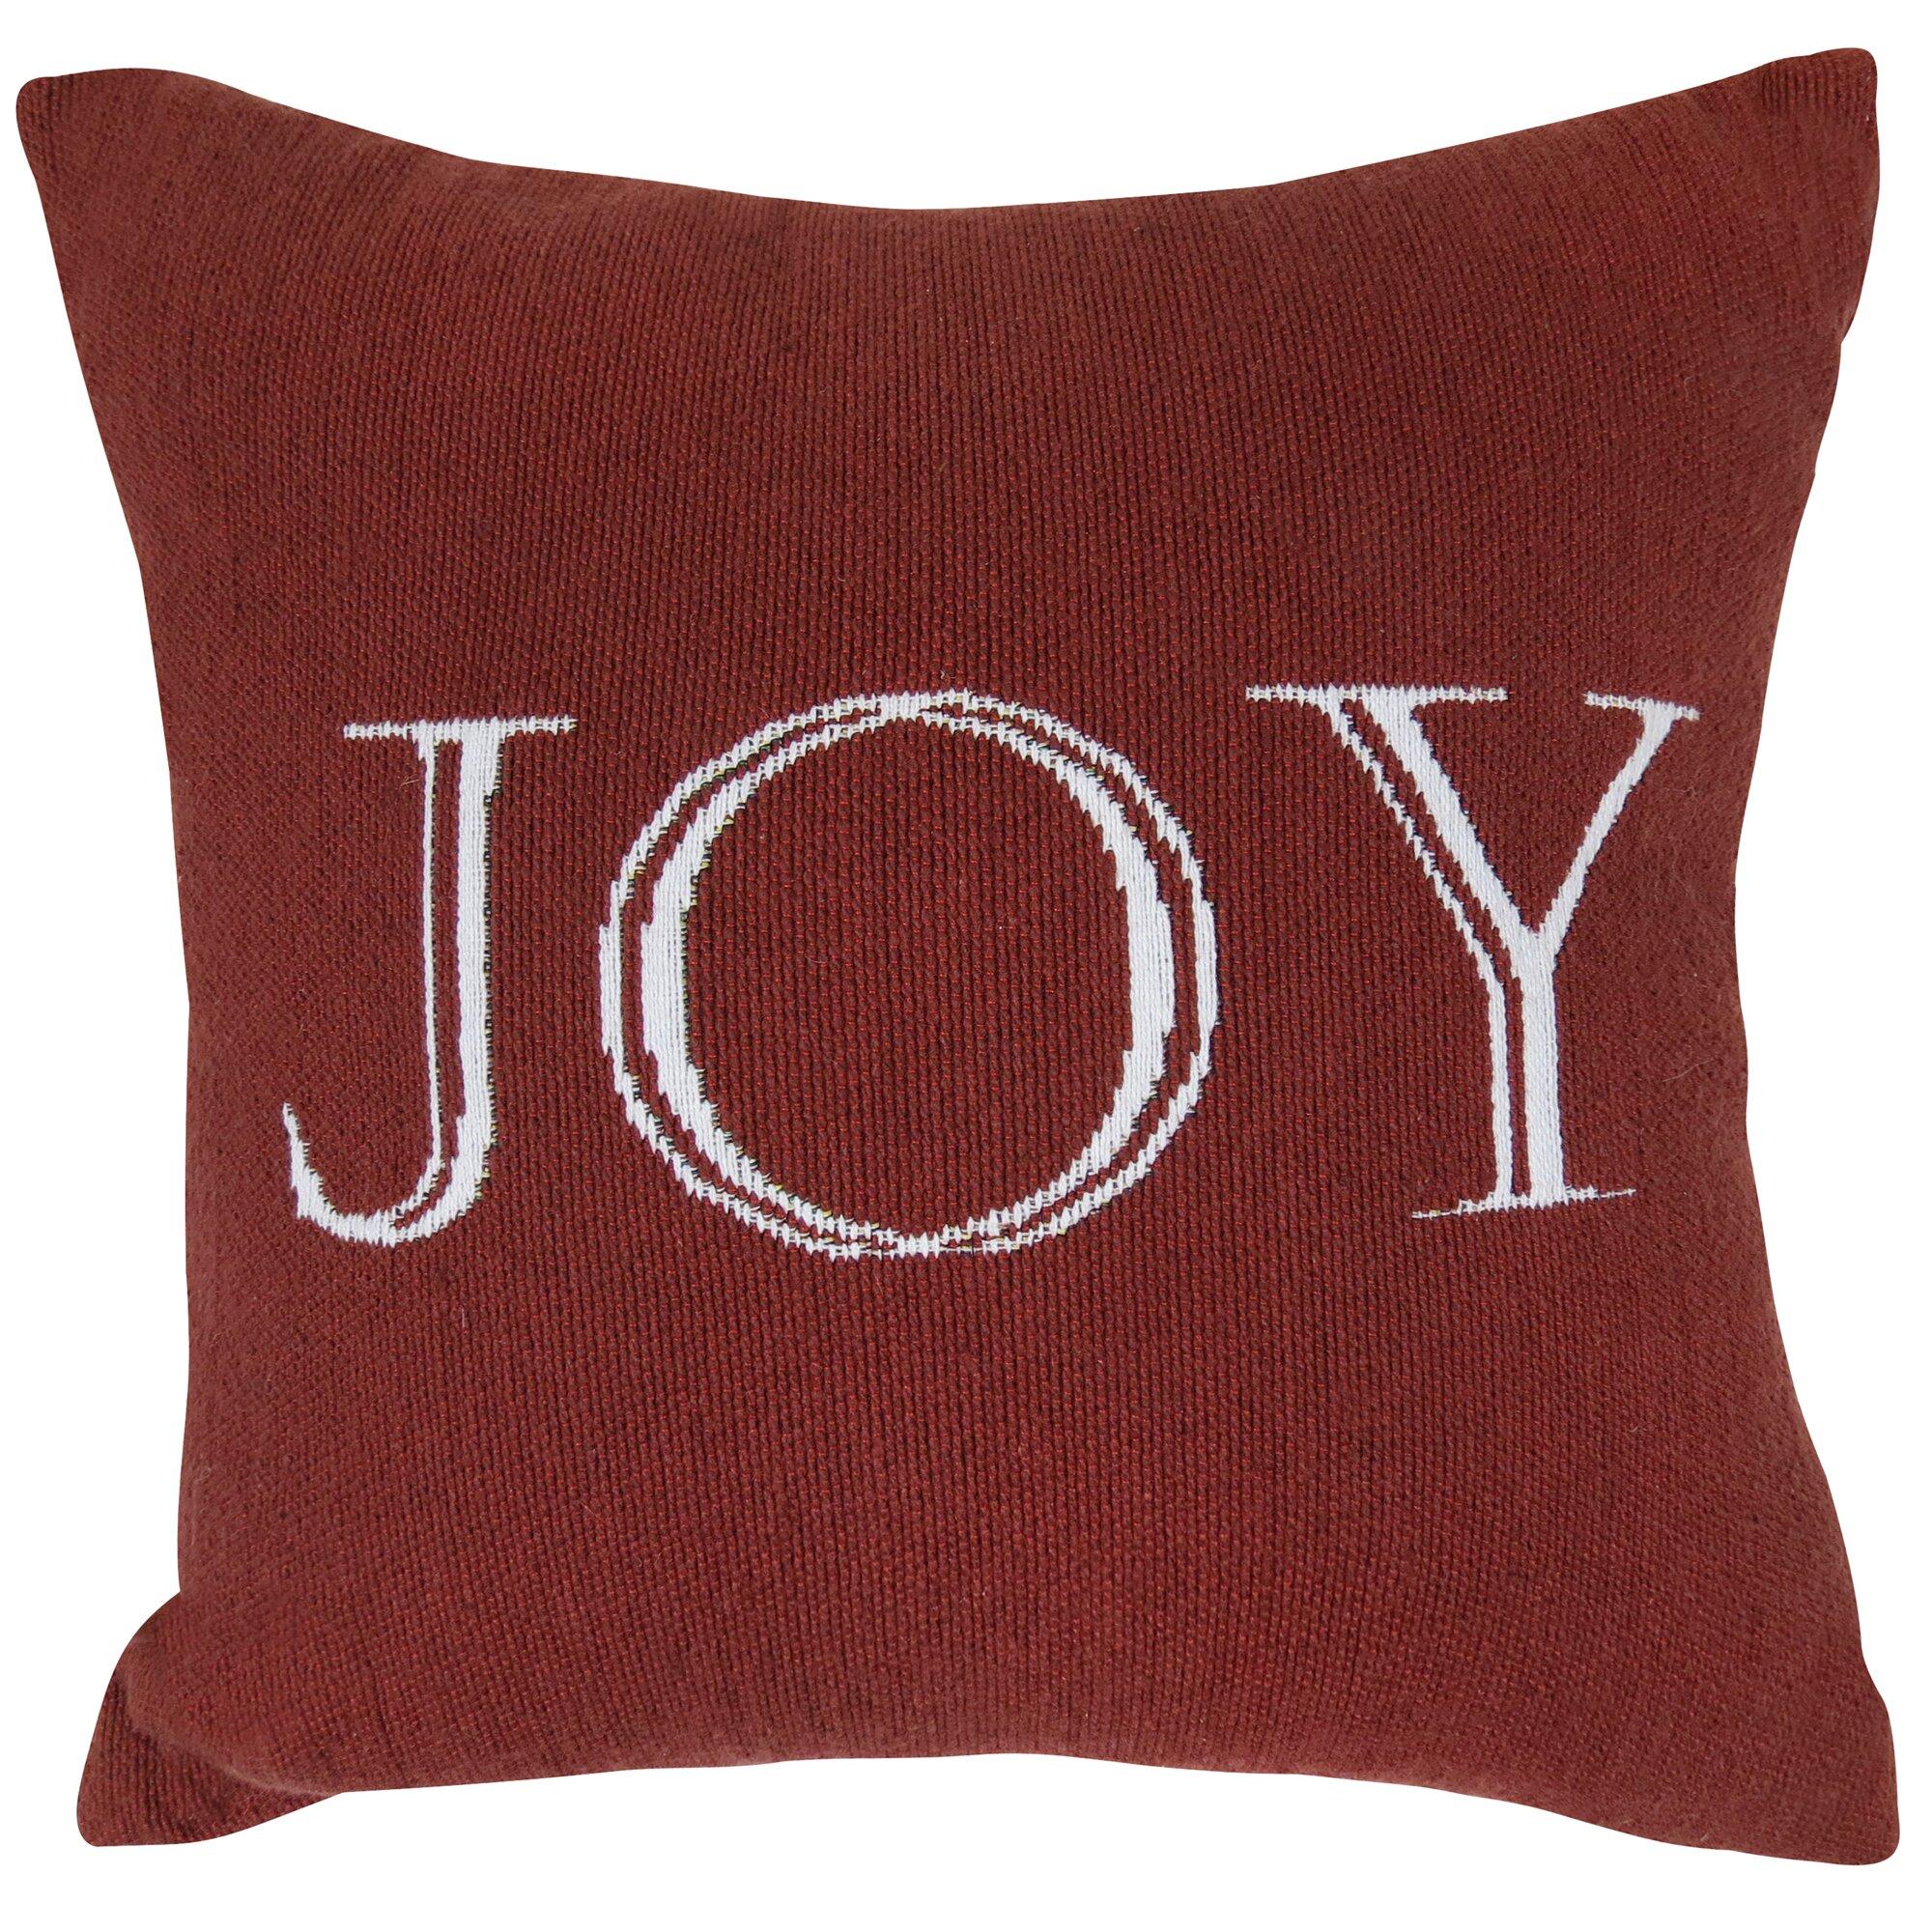 Park B Smith Ltd Vintage House Joy Tapestry Throw Pillow & Reviews Wayfair